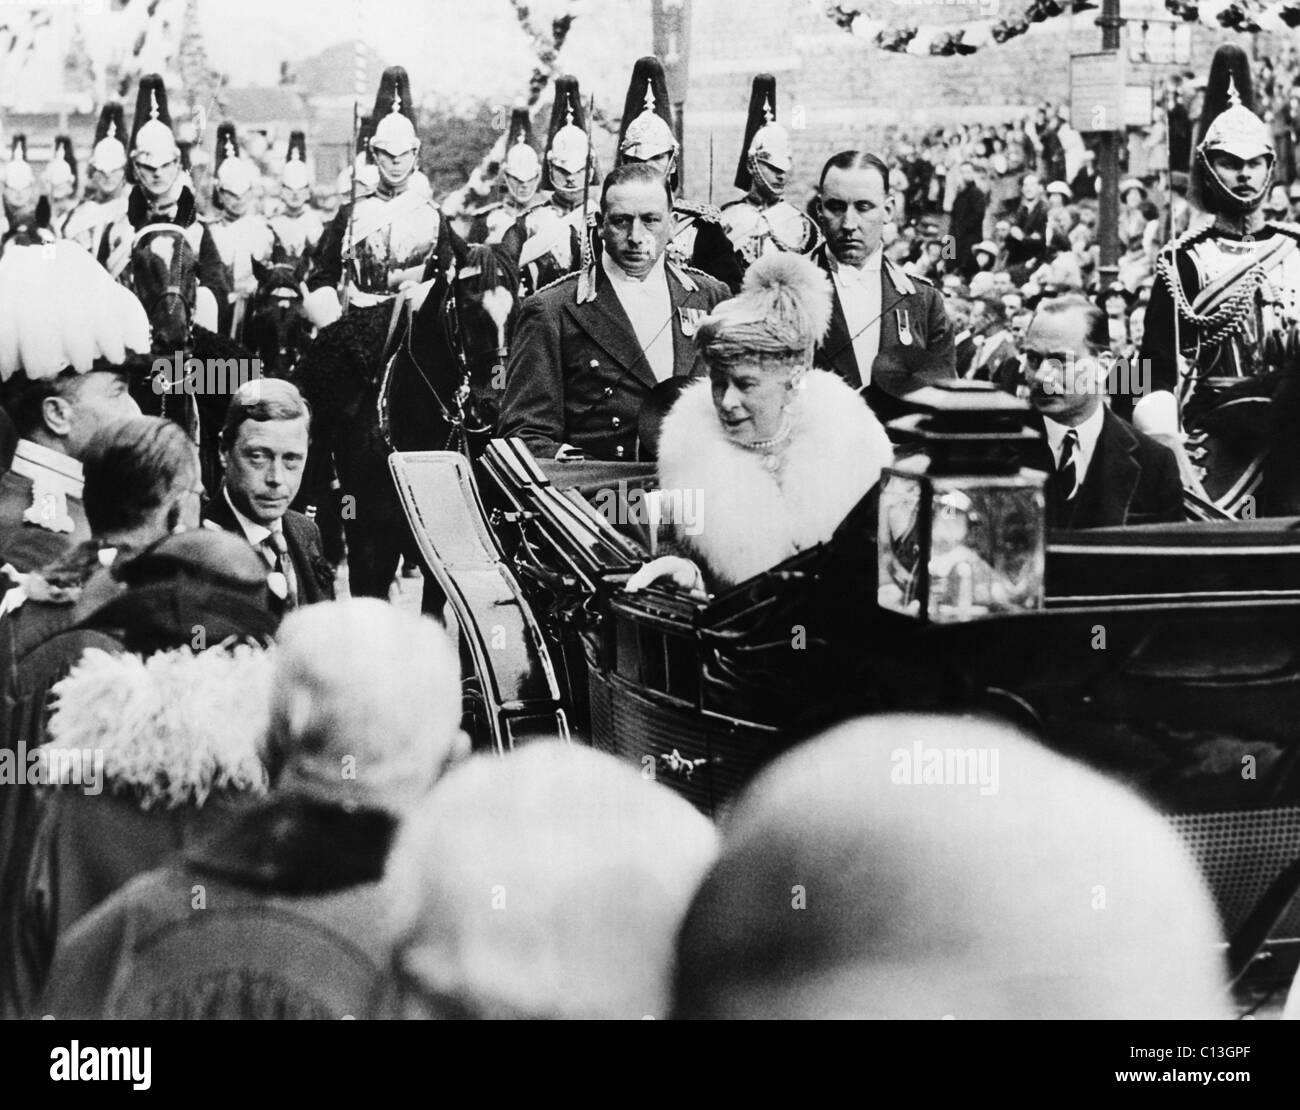 British Royalty. Left, outside coach: Prince Edward of Wales, (future Duke of Windsor). From left, inside coach: - Stock Image